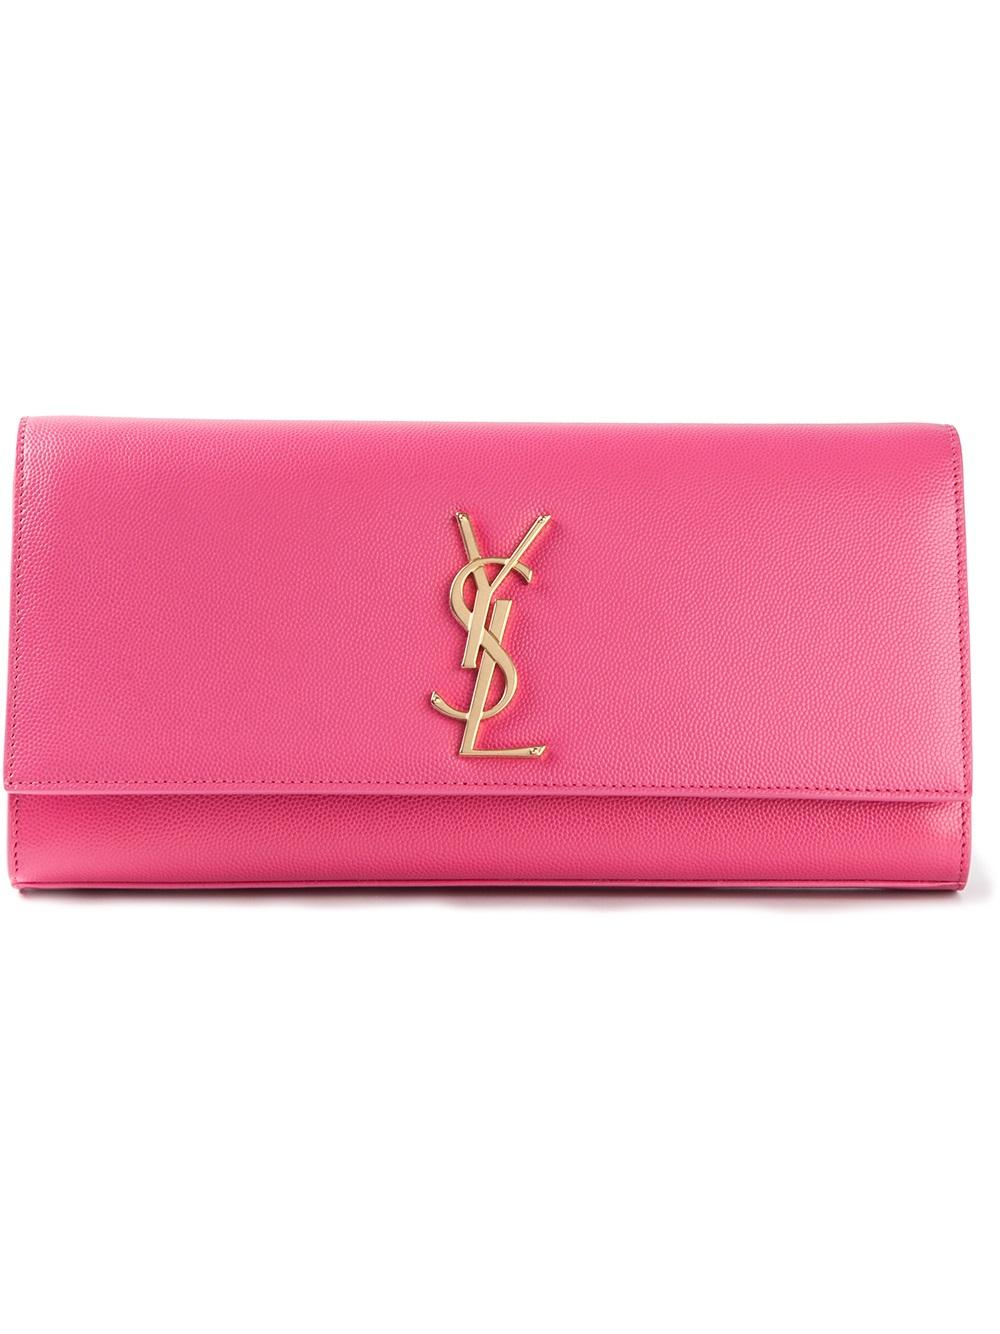 yves saint laurent chyc leather shoulder bag - Saint laurent Ysl Clutch in Pink (pink & purple) | Lyst